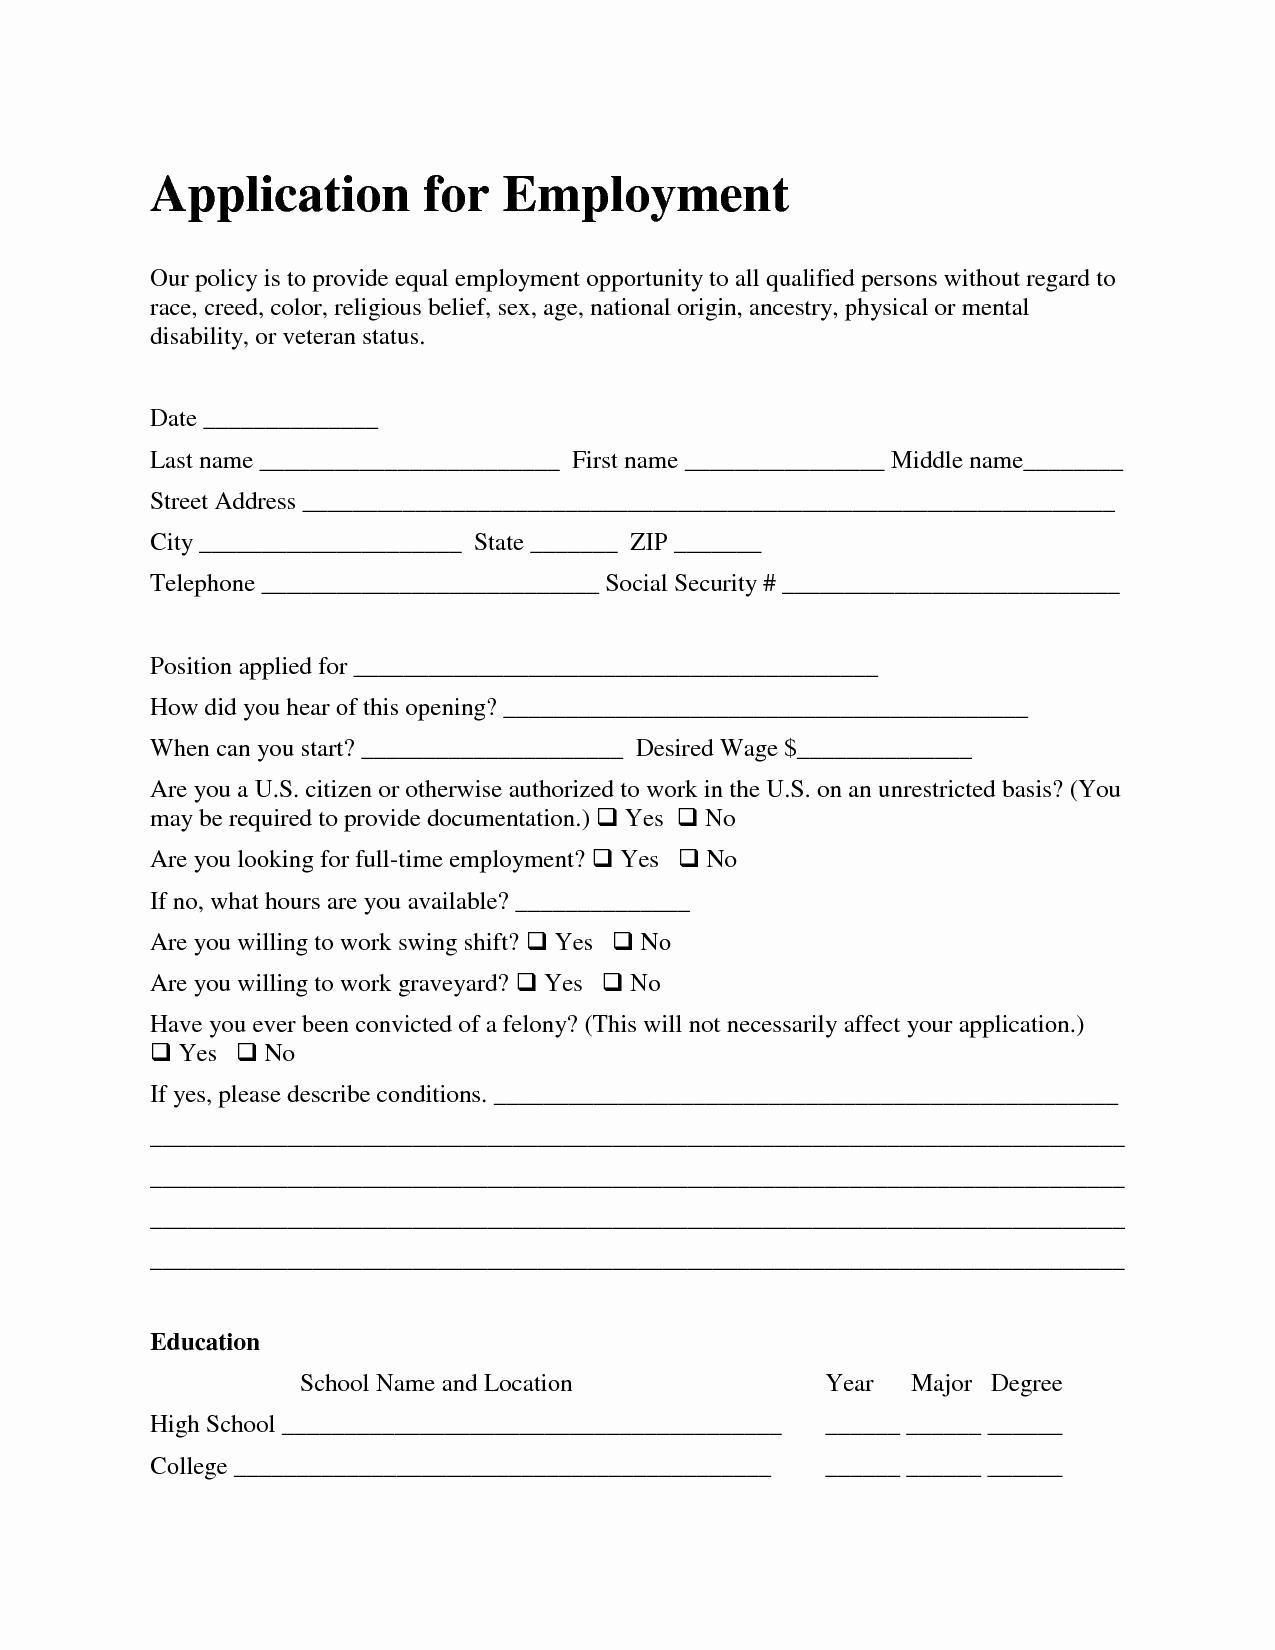 Job Application form Sample format Fresh Template Job Application Azhrzltq